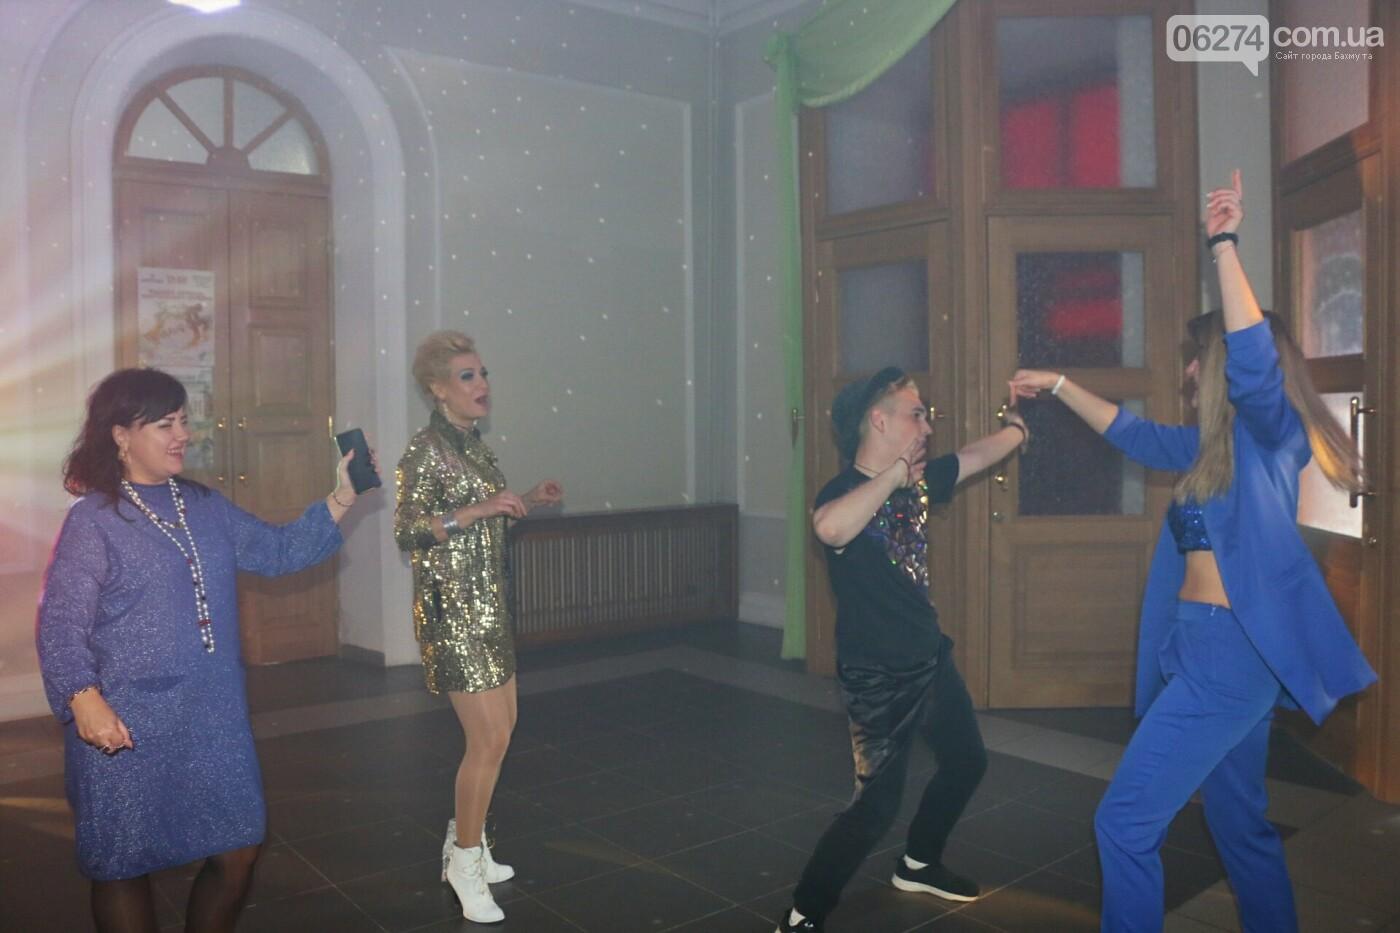 В Бахмуте провели Disco House Party (ФОТООТЧЕТ), фото-39